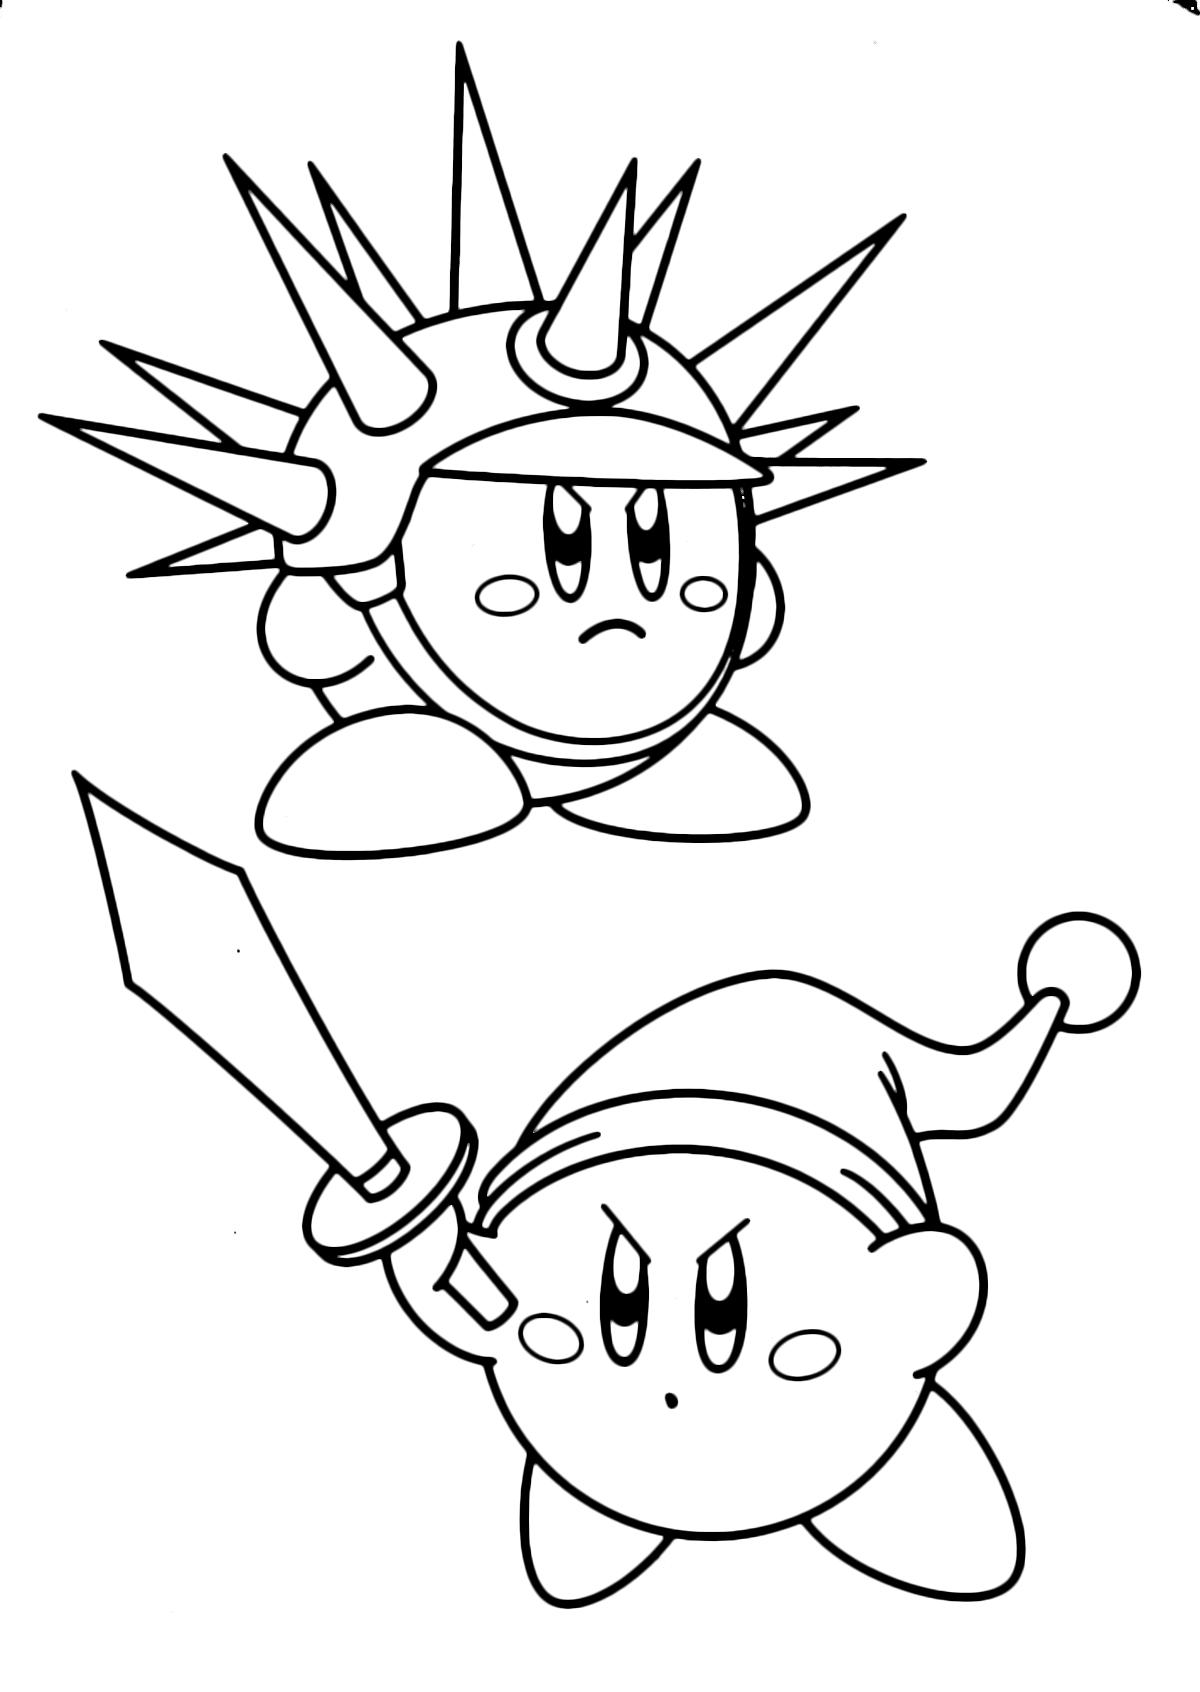 Kirby E Dibujos Imprimir Colorear Para